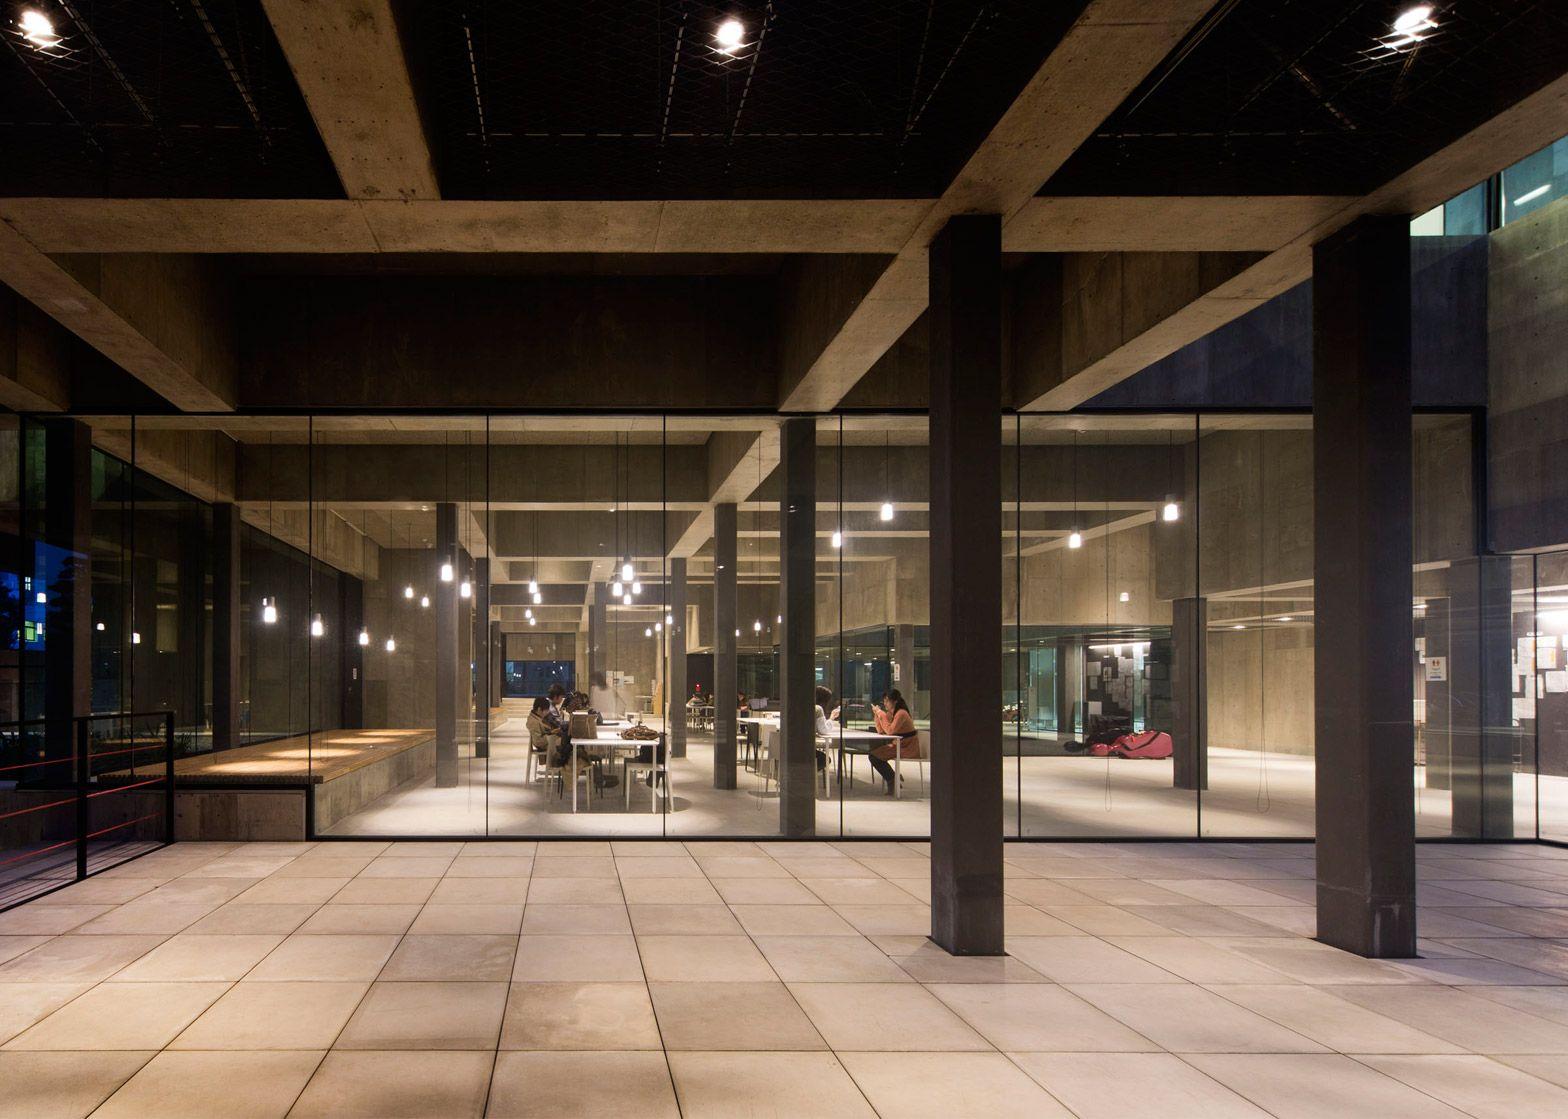 Nikken Sekkei Designed The Award Winning Tokyo Music School.